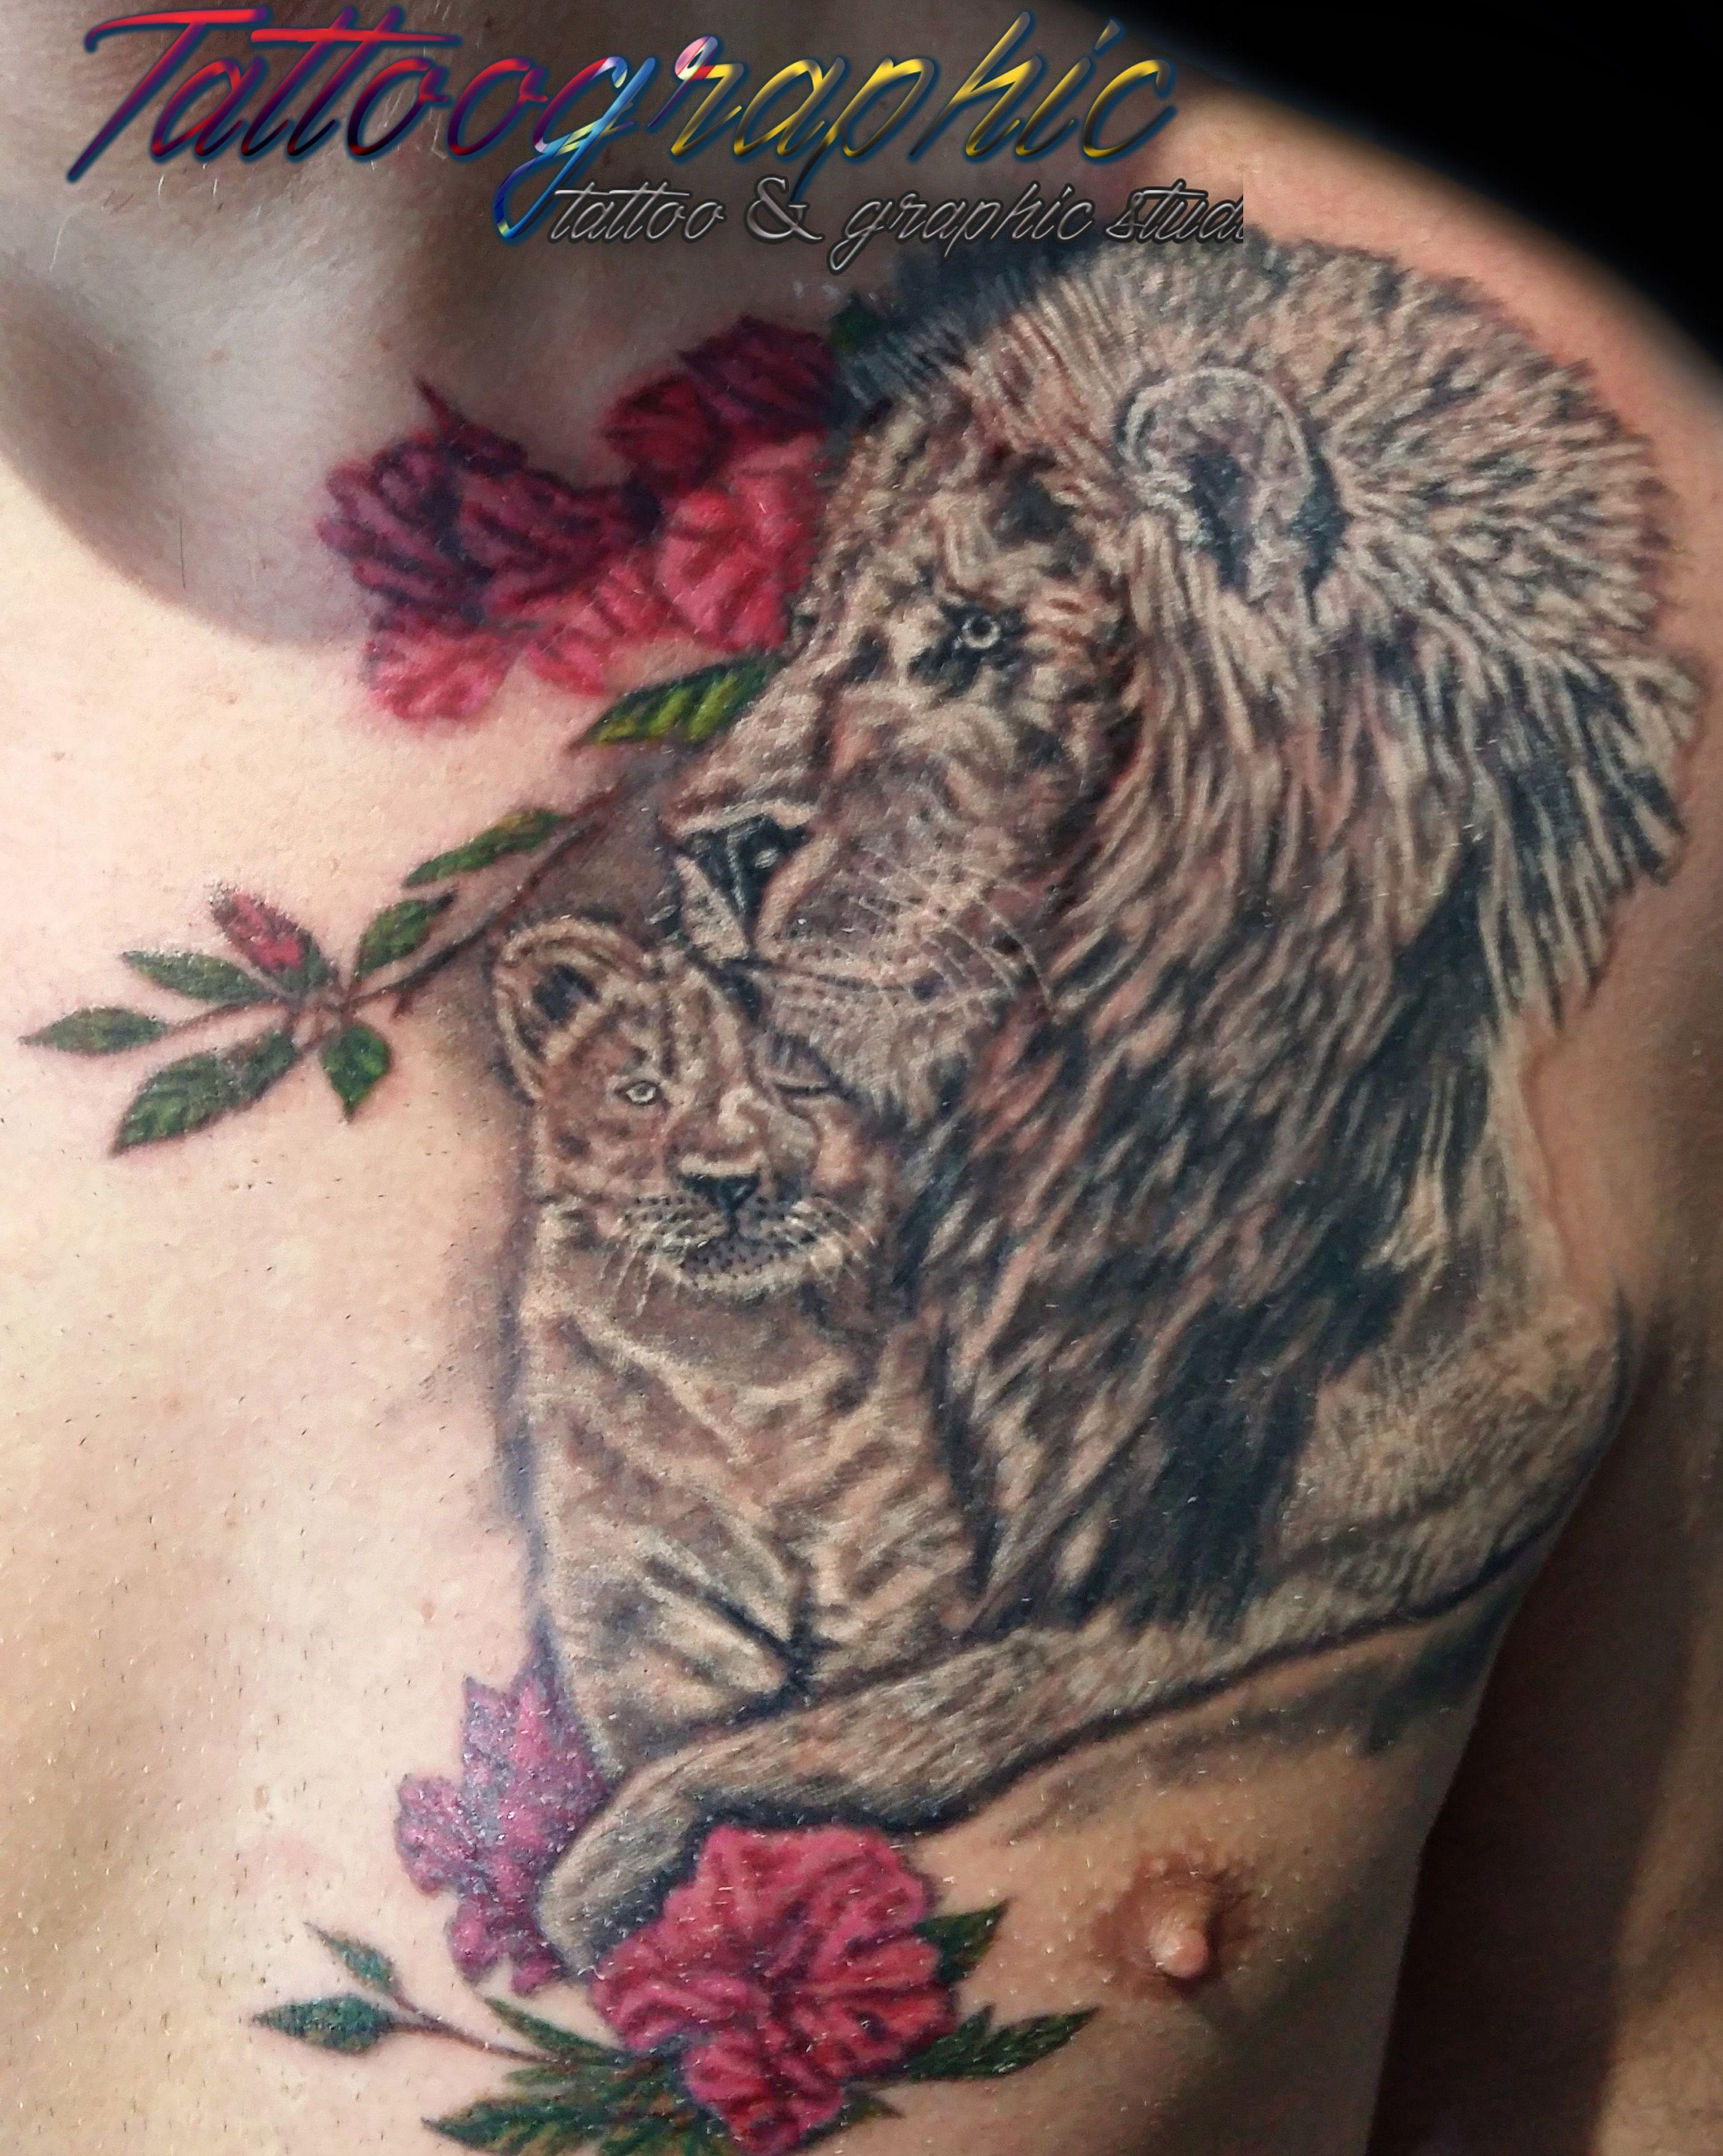 www.tattoographic.net Lion family portrait  #tattoo #tattoos #lion #liontattoo #aslandövmesi #tattoographic #adanadövme #dövmeadana #tattooadana #adanatattoo #besttattoo #tattoostudio #dövmesanatı #dövmeci #tattooartist #tattooist #tattoolovers #dövmemodelleri #dövmeler #adanaeniyidövme #eniyidövmeadana #adanadövmeci #adanadatattoo #tattooadana